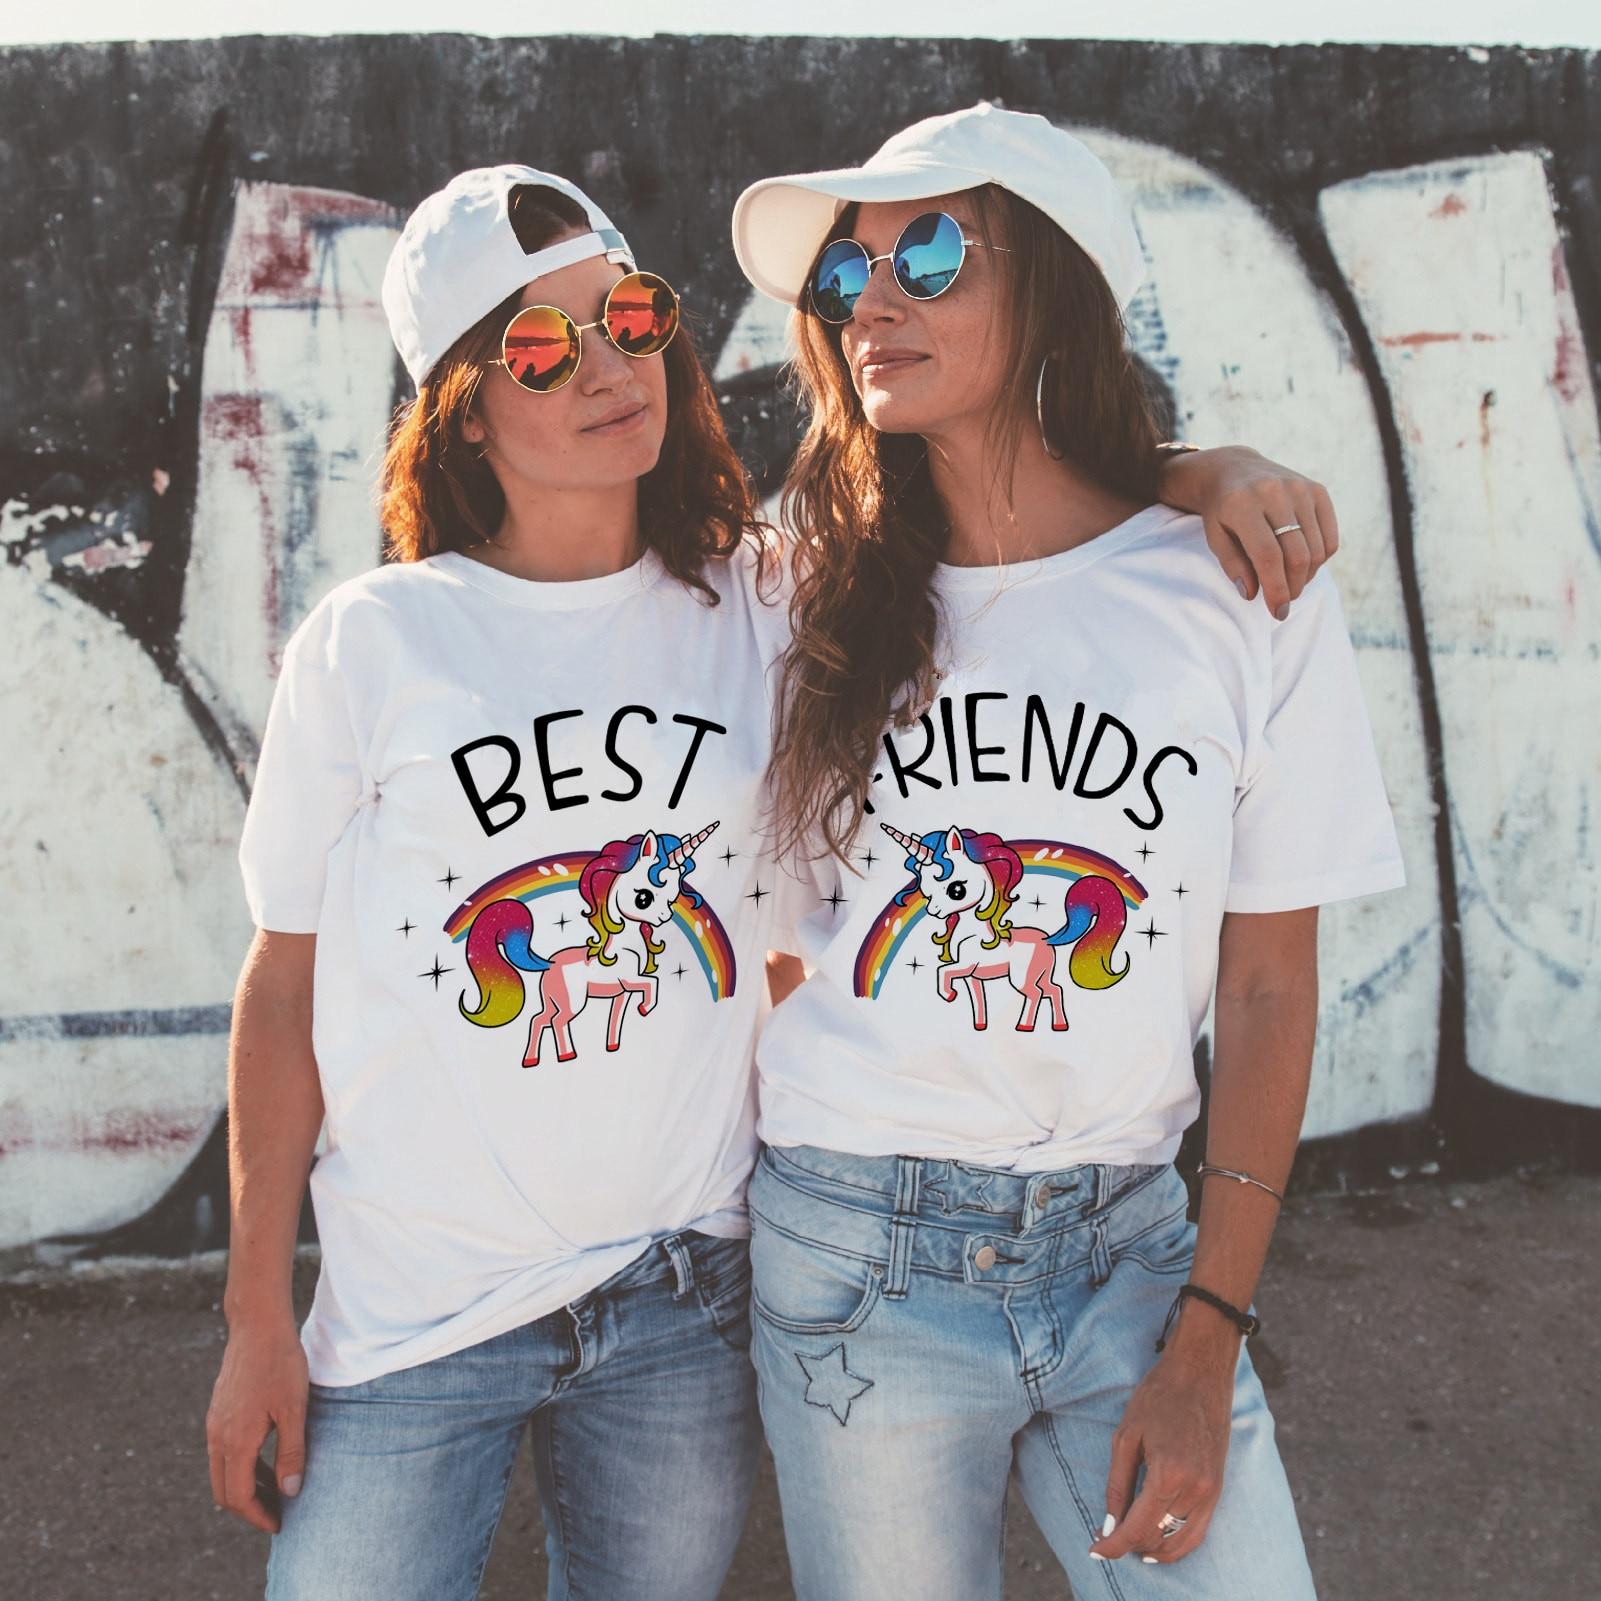 Newest Best Friends   T     Shirt   Women Harajuku Kawaii BFF   T  -  shirt   90s Graphic Cartoon Tshirt Funny Fashion Top Tees Streetwea Female